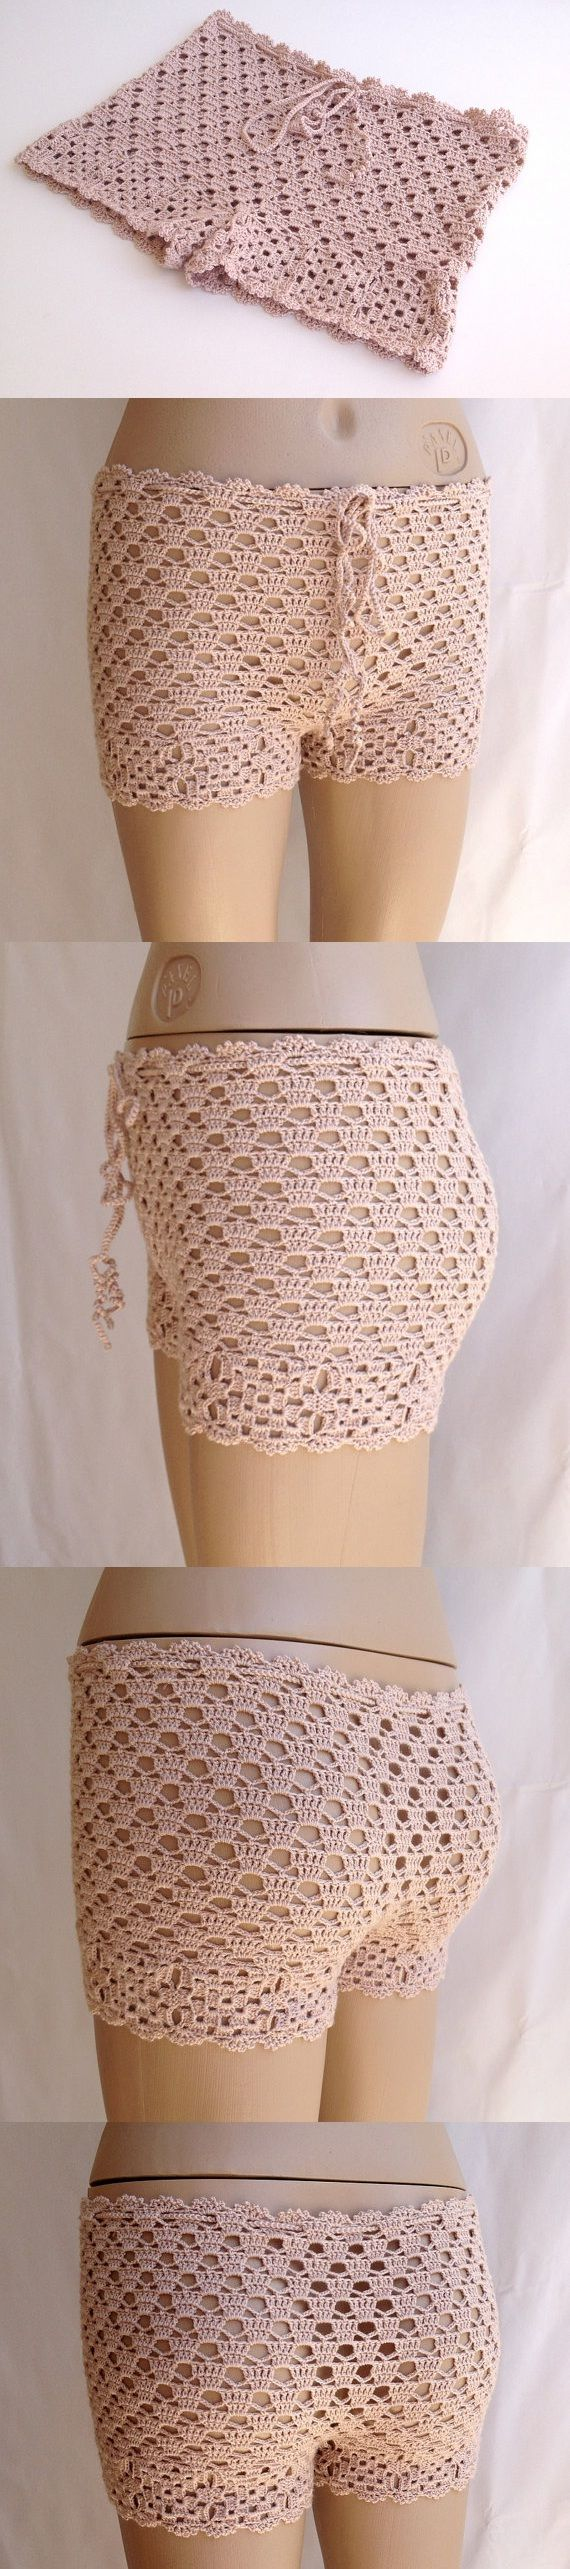 powder pink shorts lace shorts crochet women beach shorts summer short swimsuit mini shorts senoaccessory